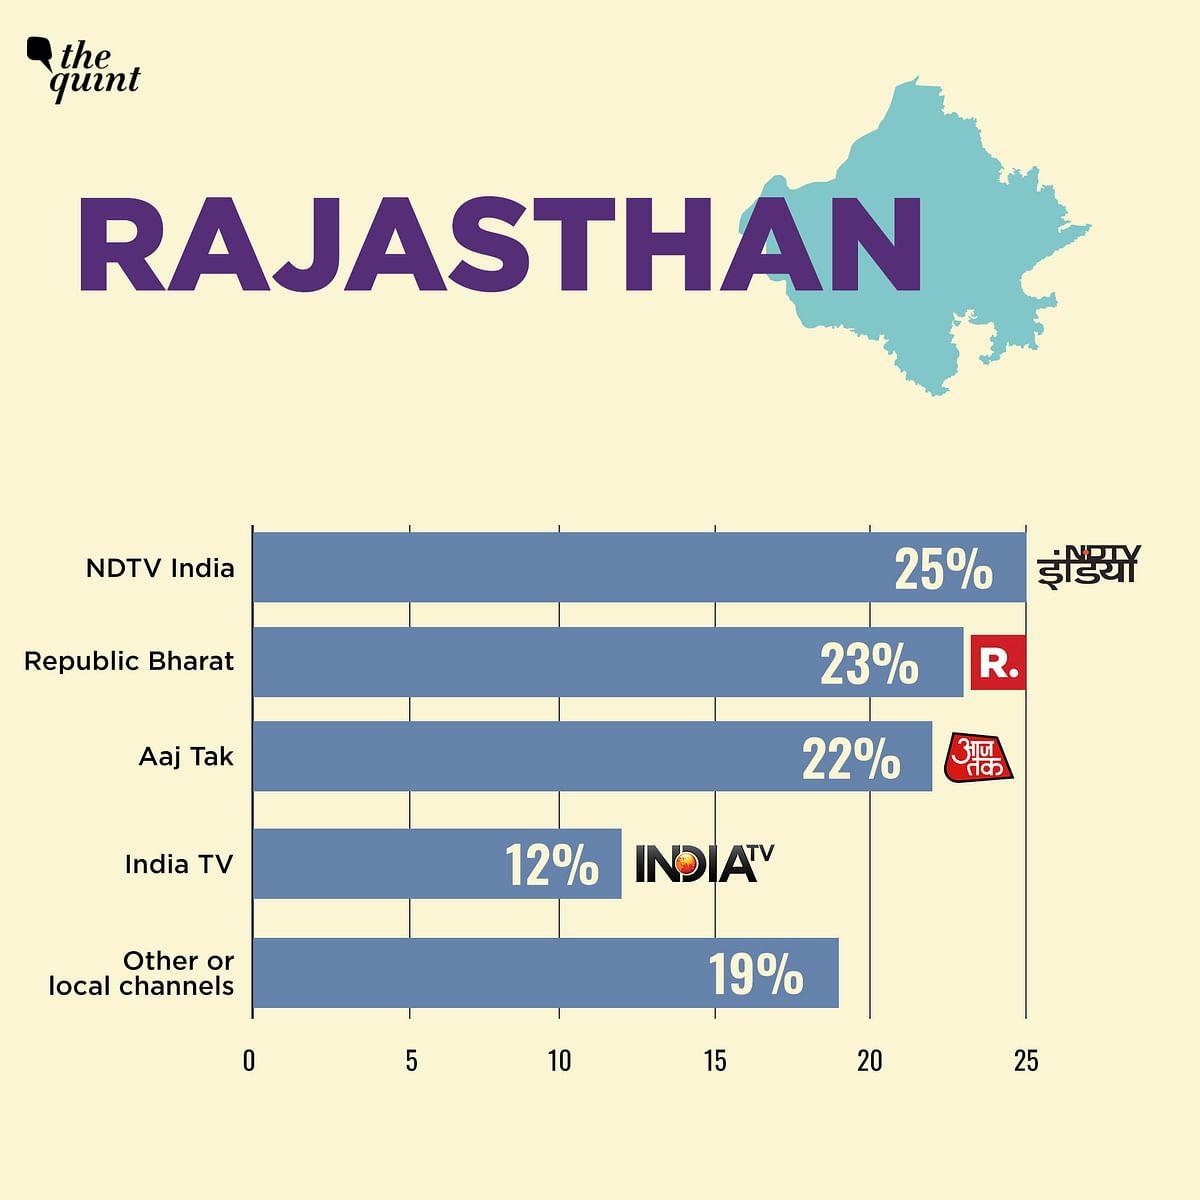 23% People in Bihar, MP, Rajasthan, Jharkhand Watch NDTV: Survey